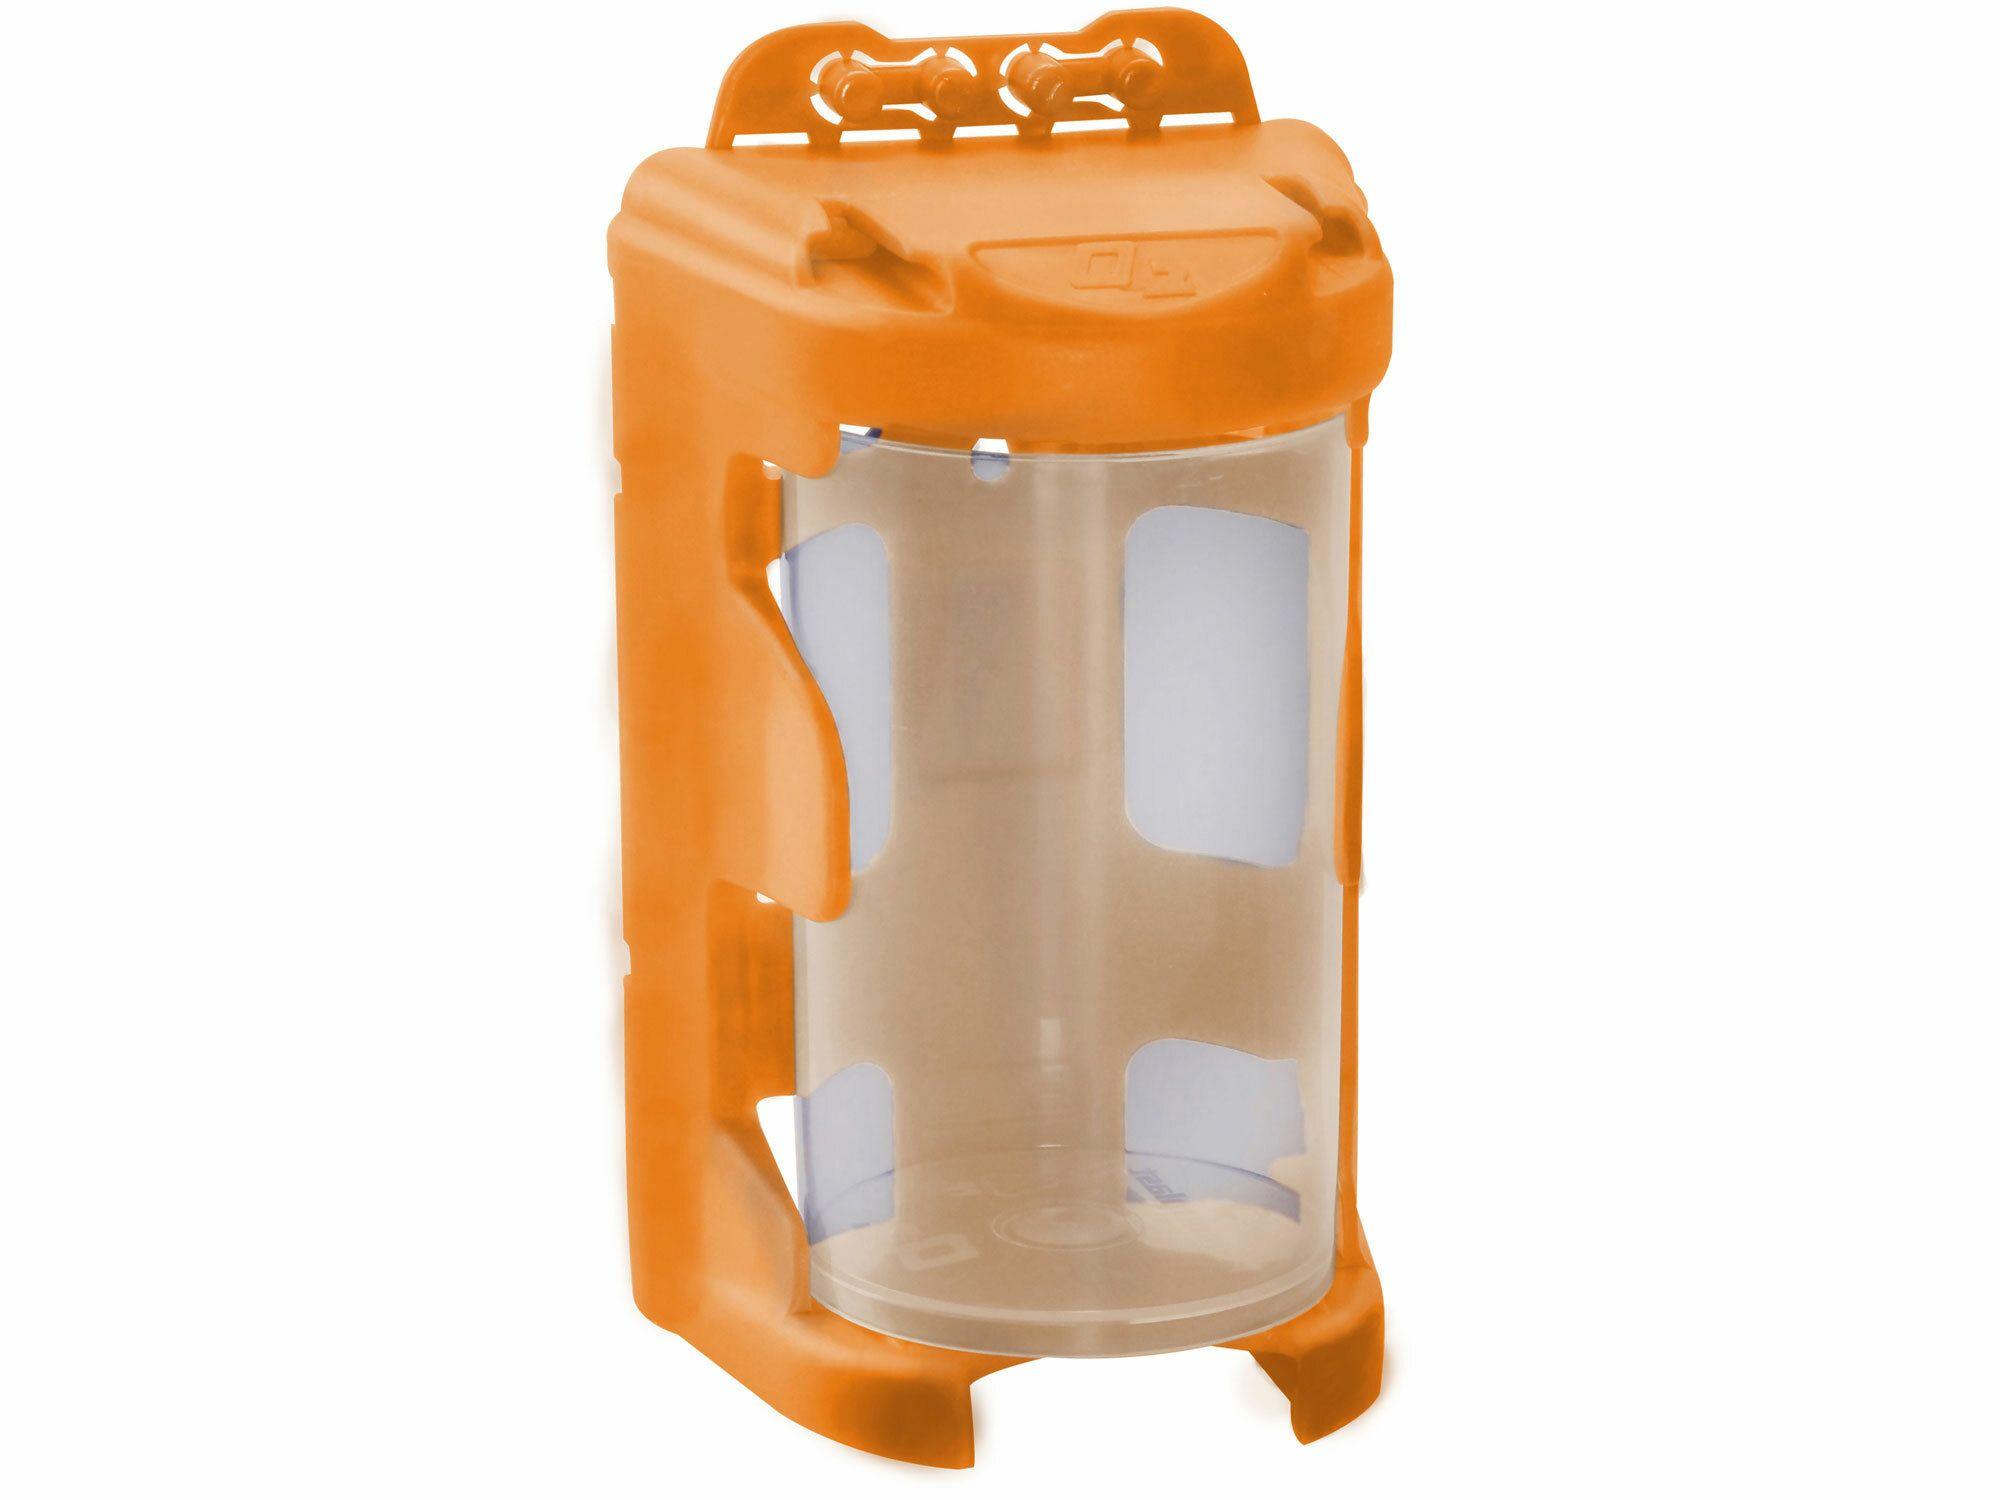 Organizér modulový závěsný - oranžový, 210ml (60 x 92mm), PP, EXTOL EXTOL CRAFT